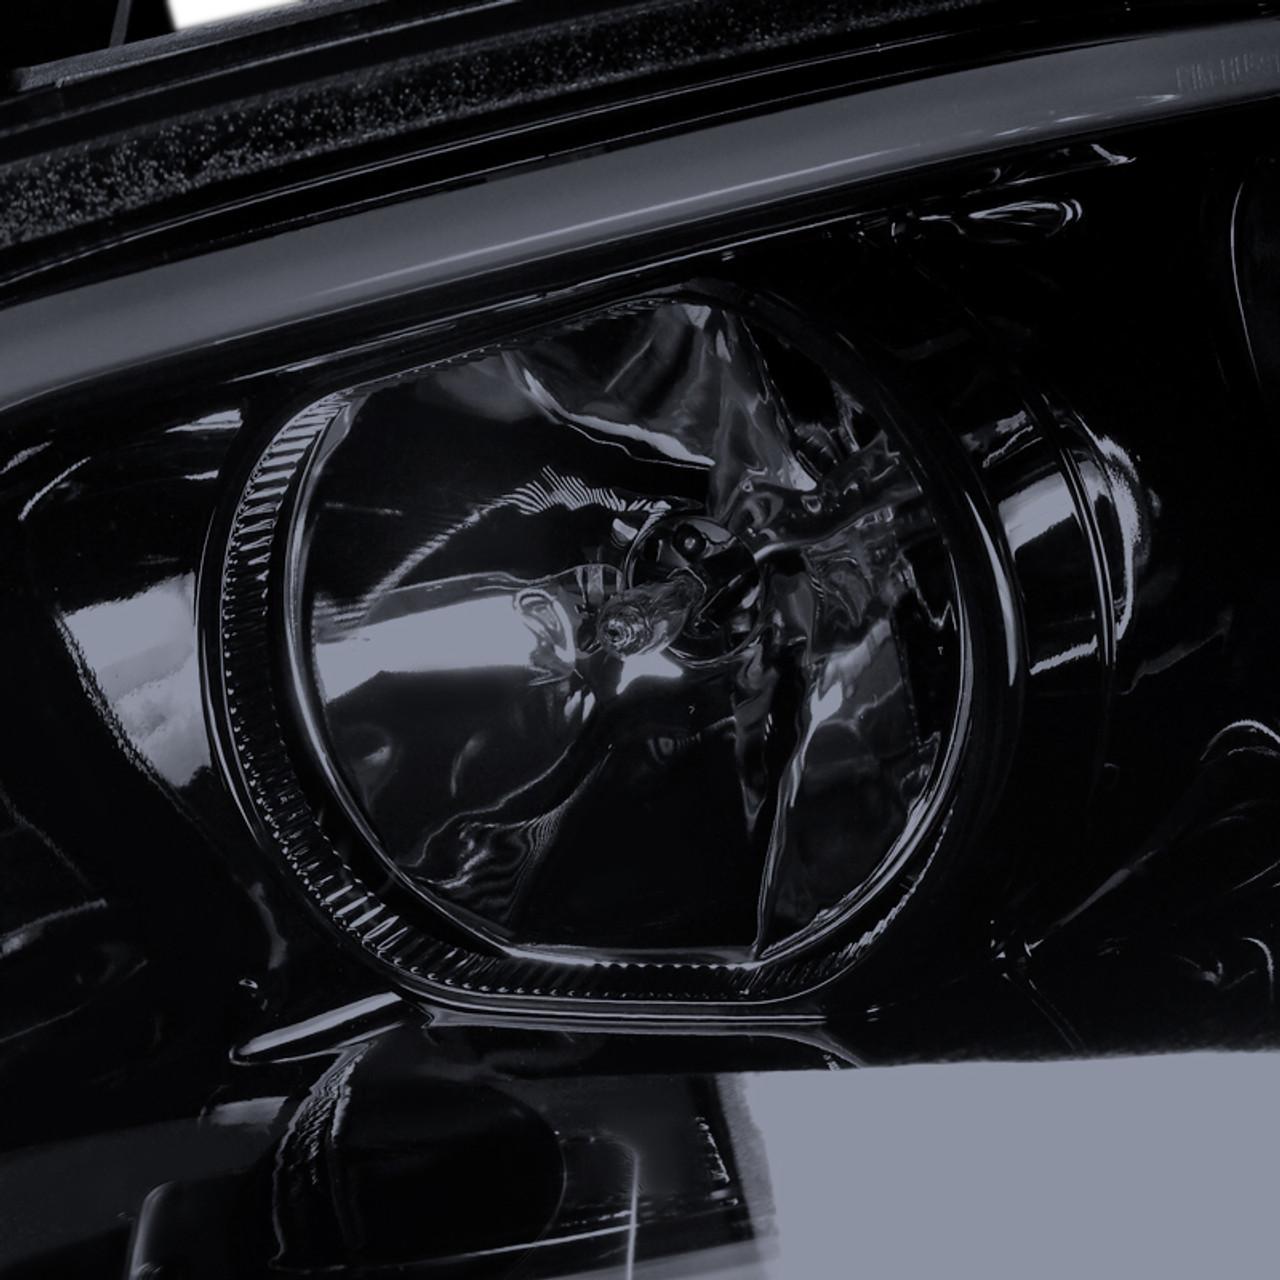 2008 2009 pontiac g8 glossy black housing smoke lens projector headlights w led drl bar h1 bulbs k2 motor 2008 2009 pontiac g8 glossy black housing smoke lens projector headlights w led drl bar h1 bulbs